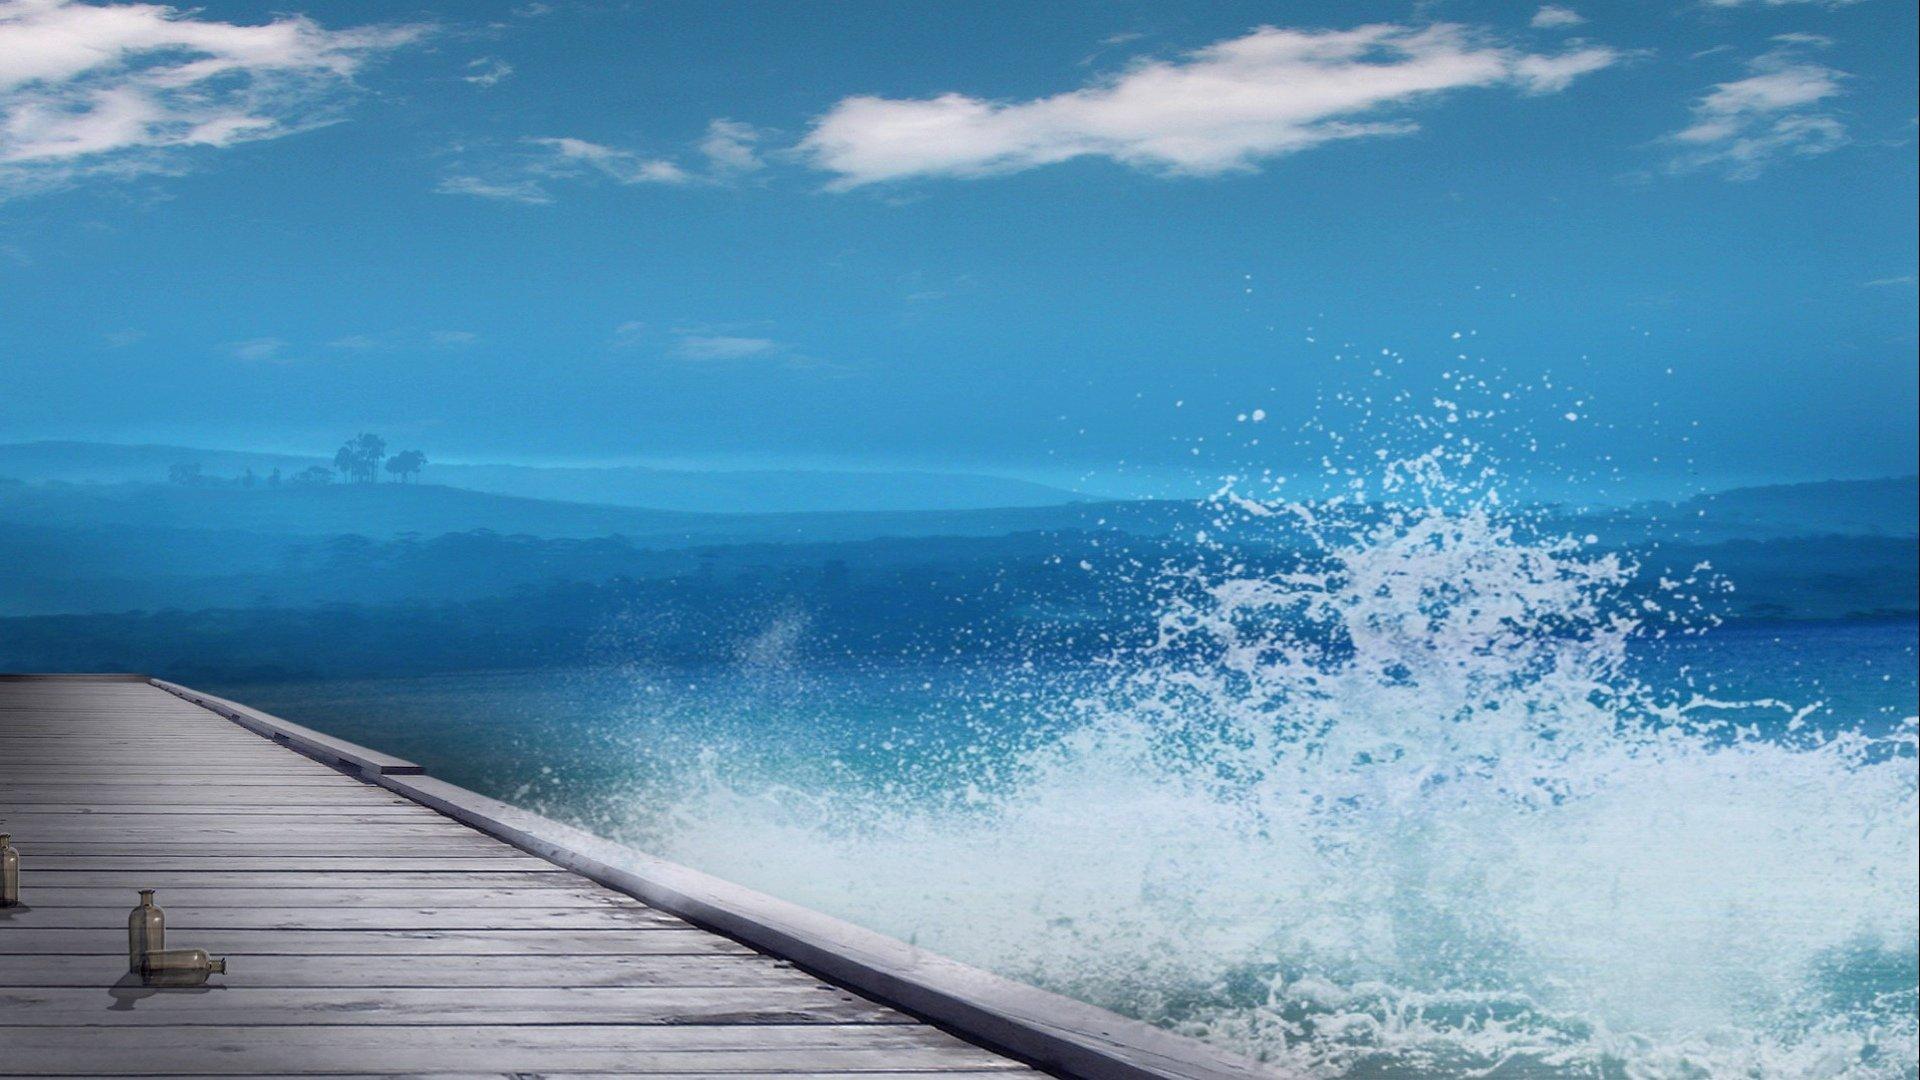 Free Download Hd Widescreen Christmas Desktop Wallpaper